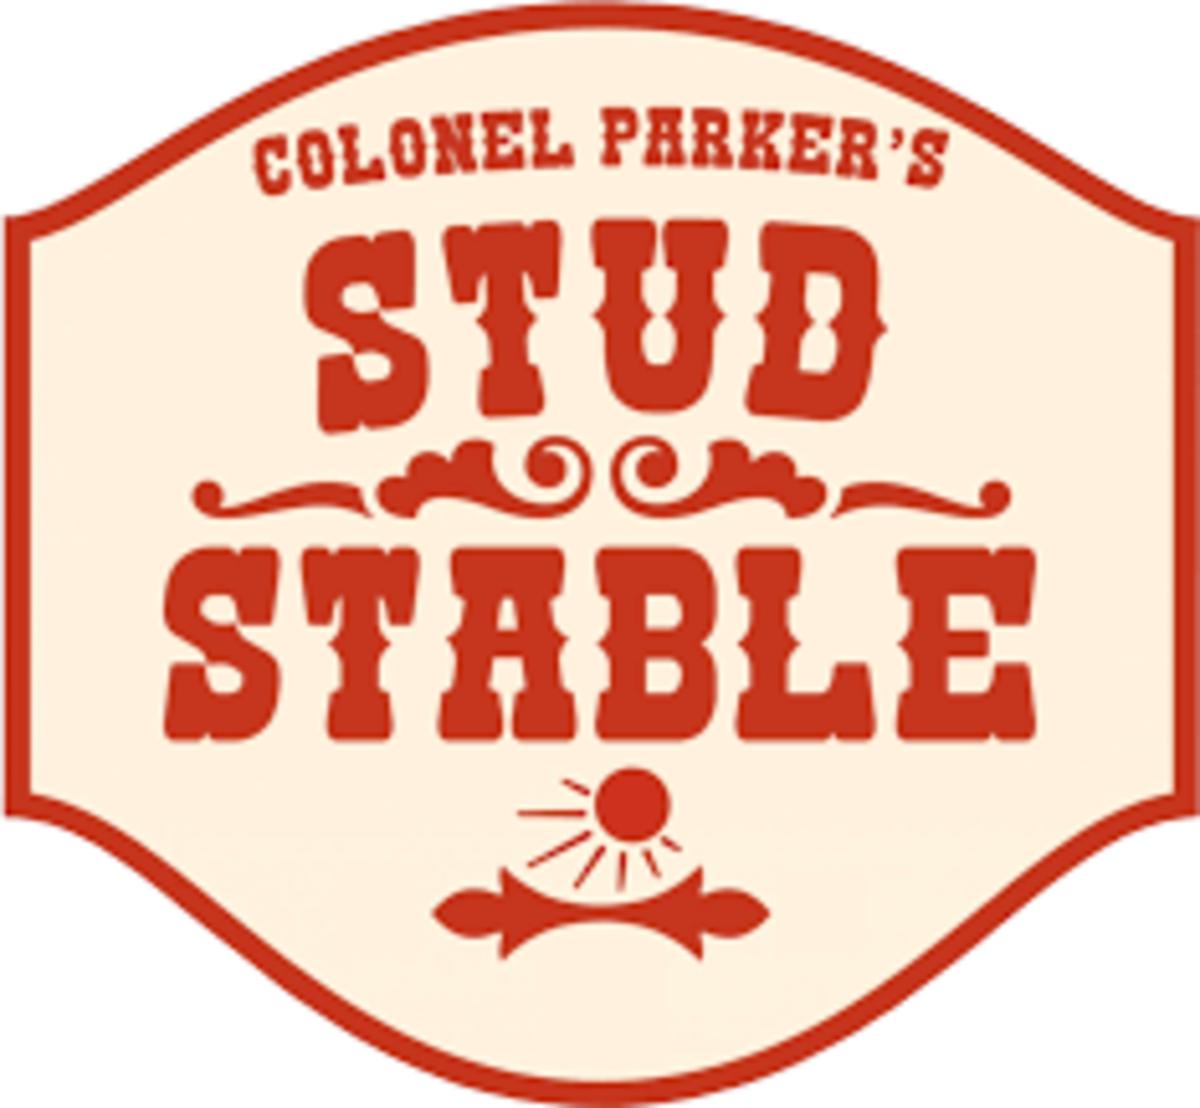 stud stable